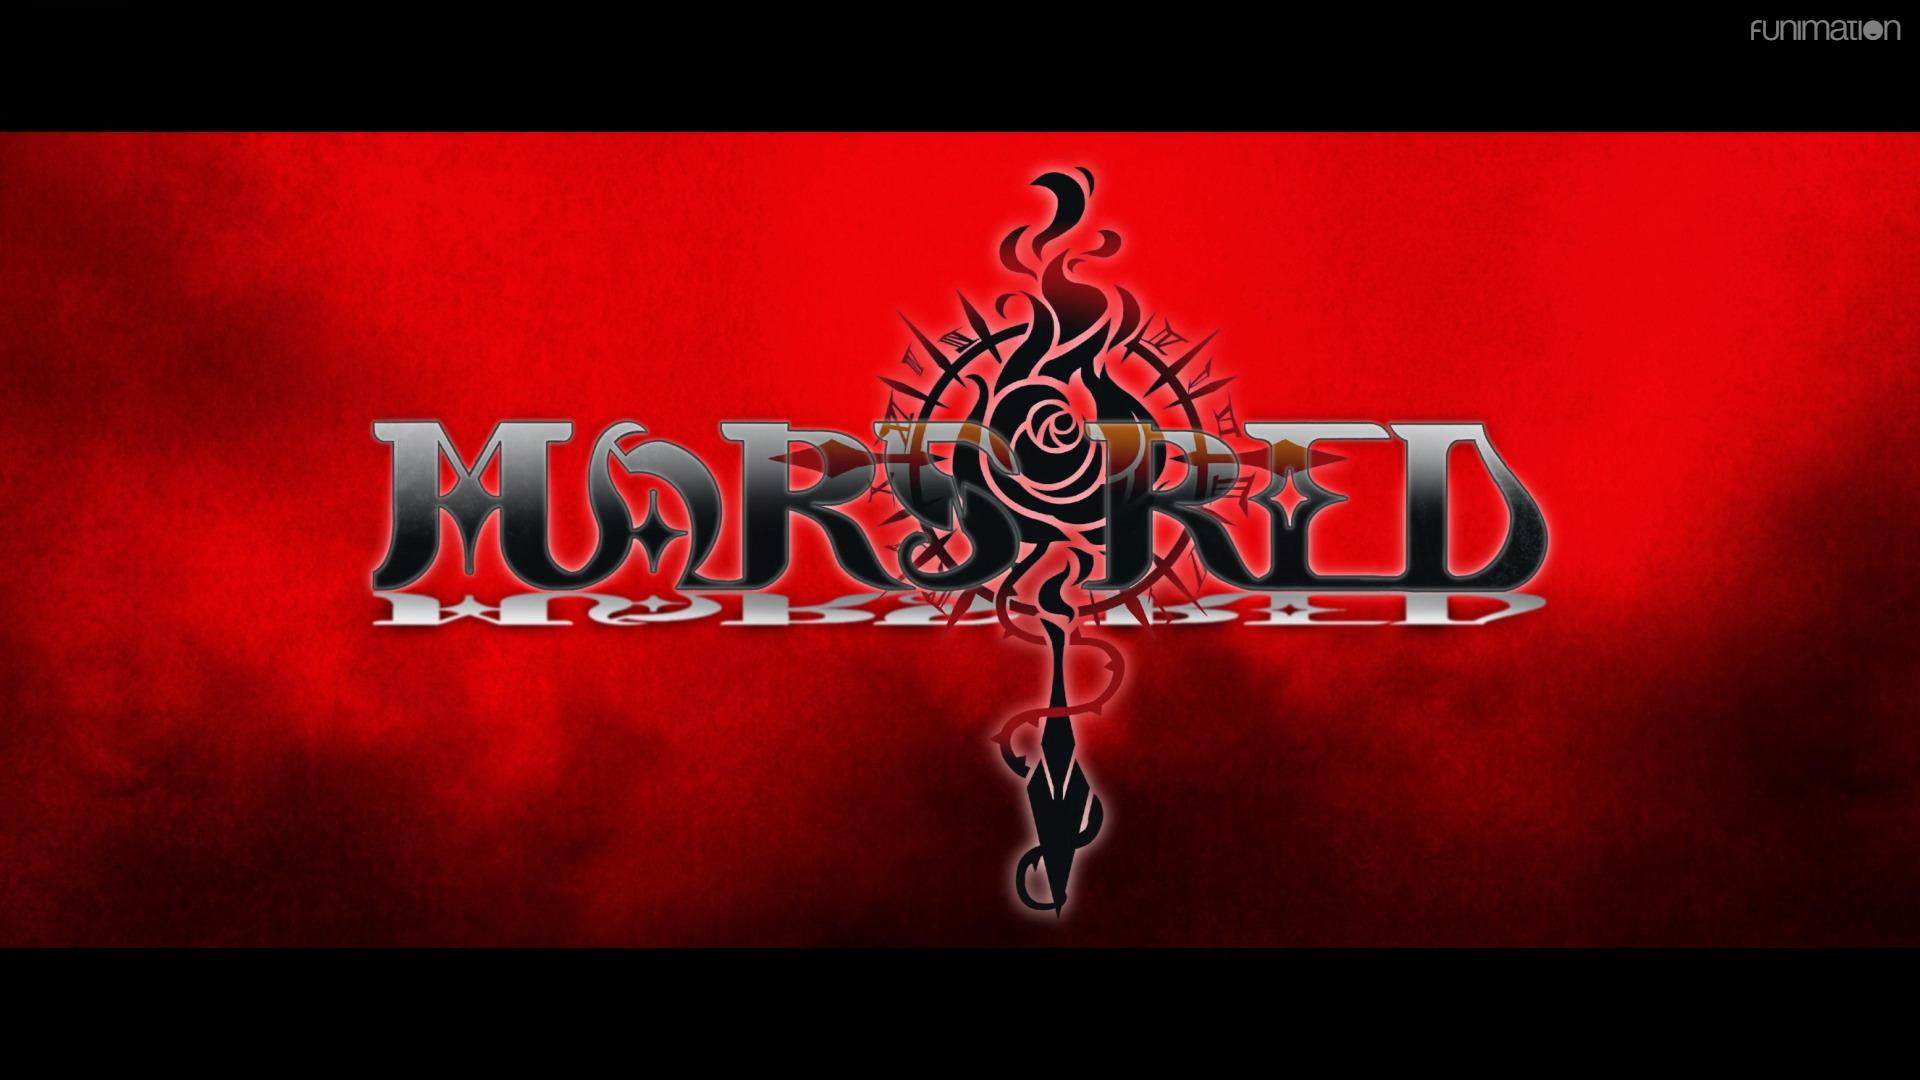 MARS RED Vampire Soldiers Logo